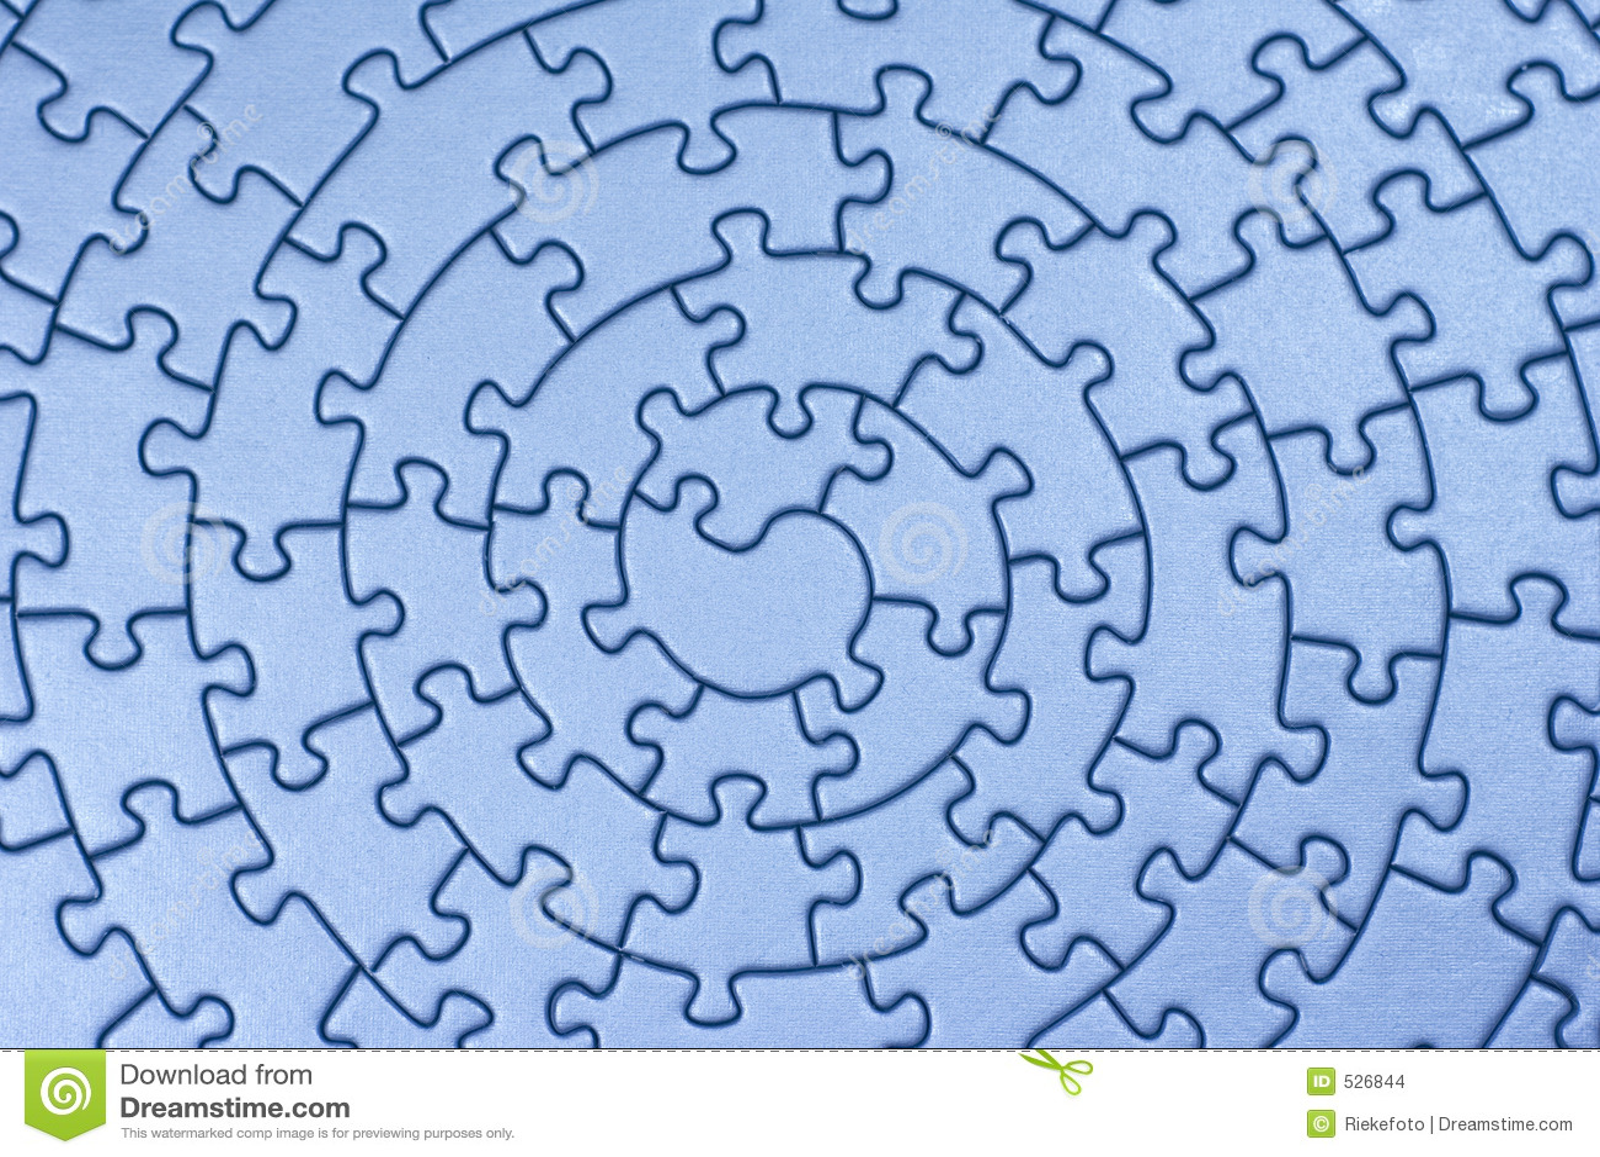 Complete blue jigsaw